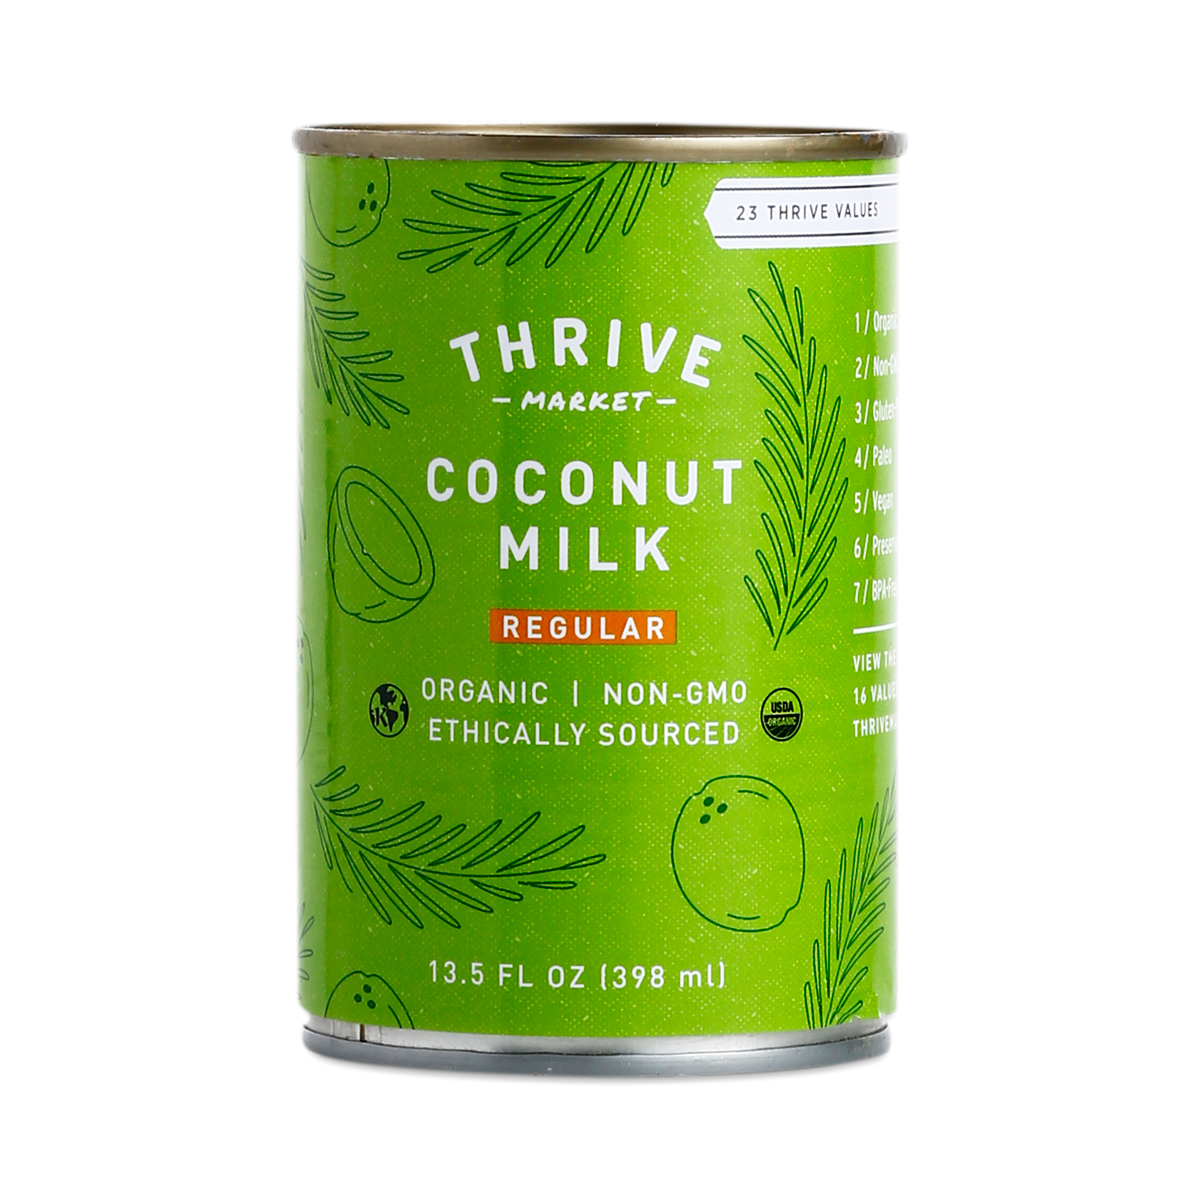 thrive-market-coconut-milk.jpg